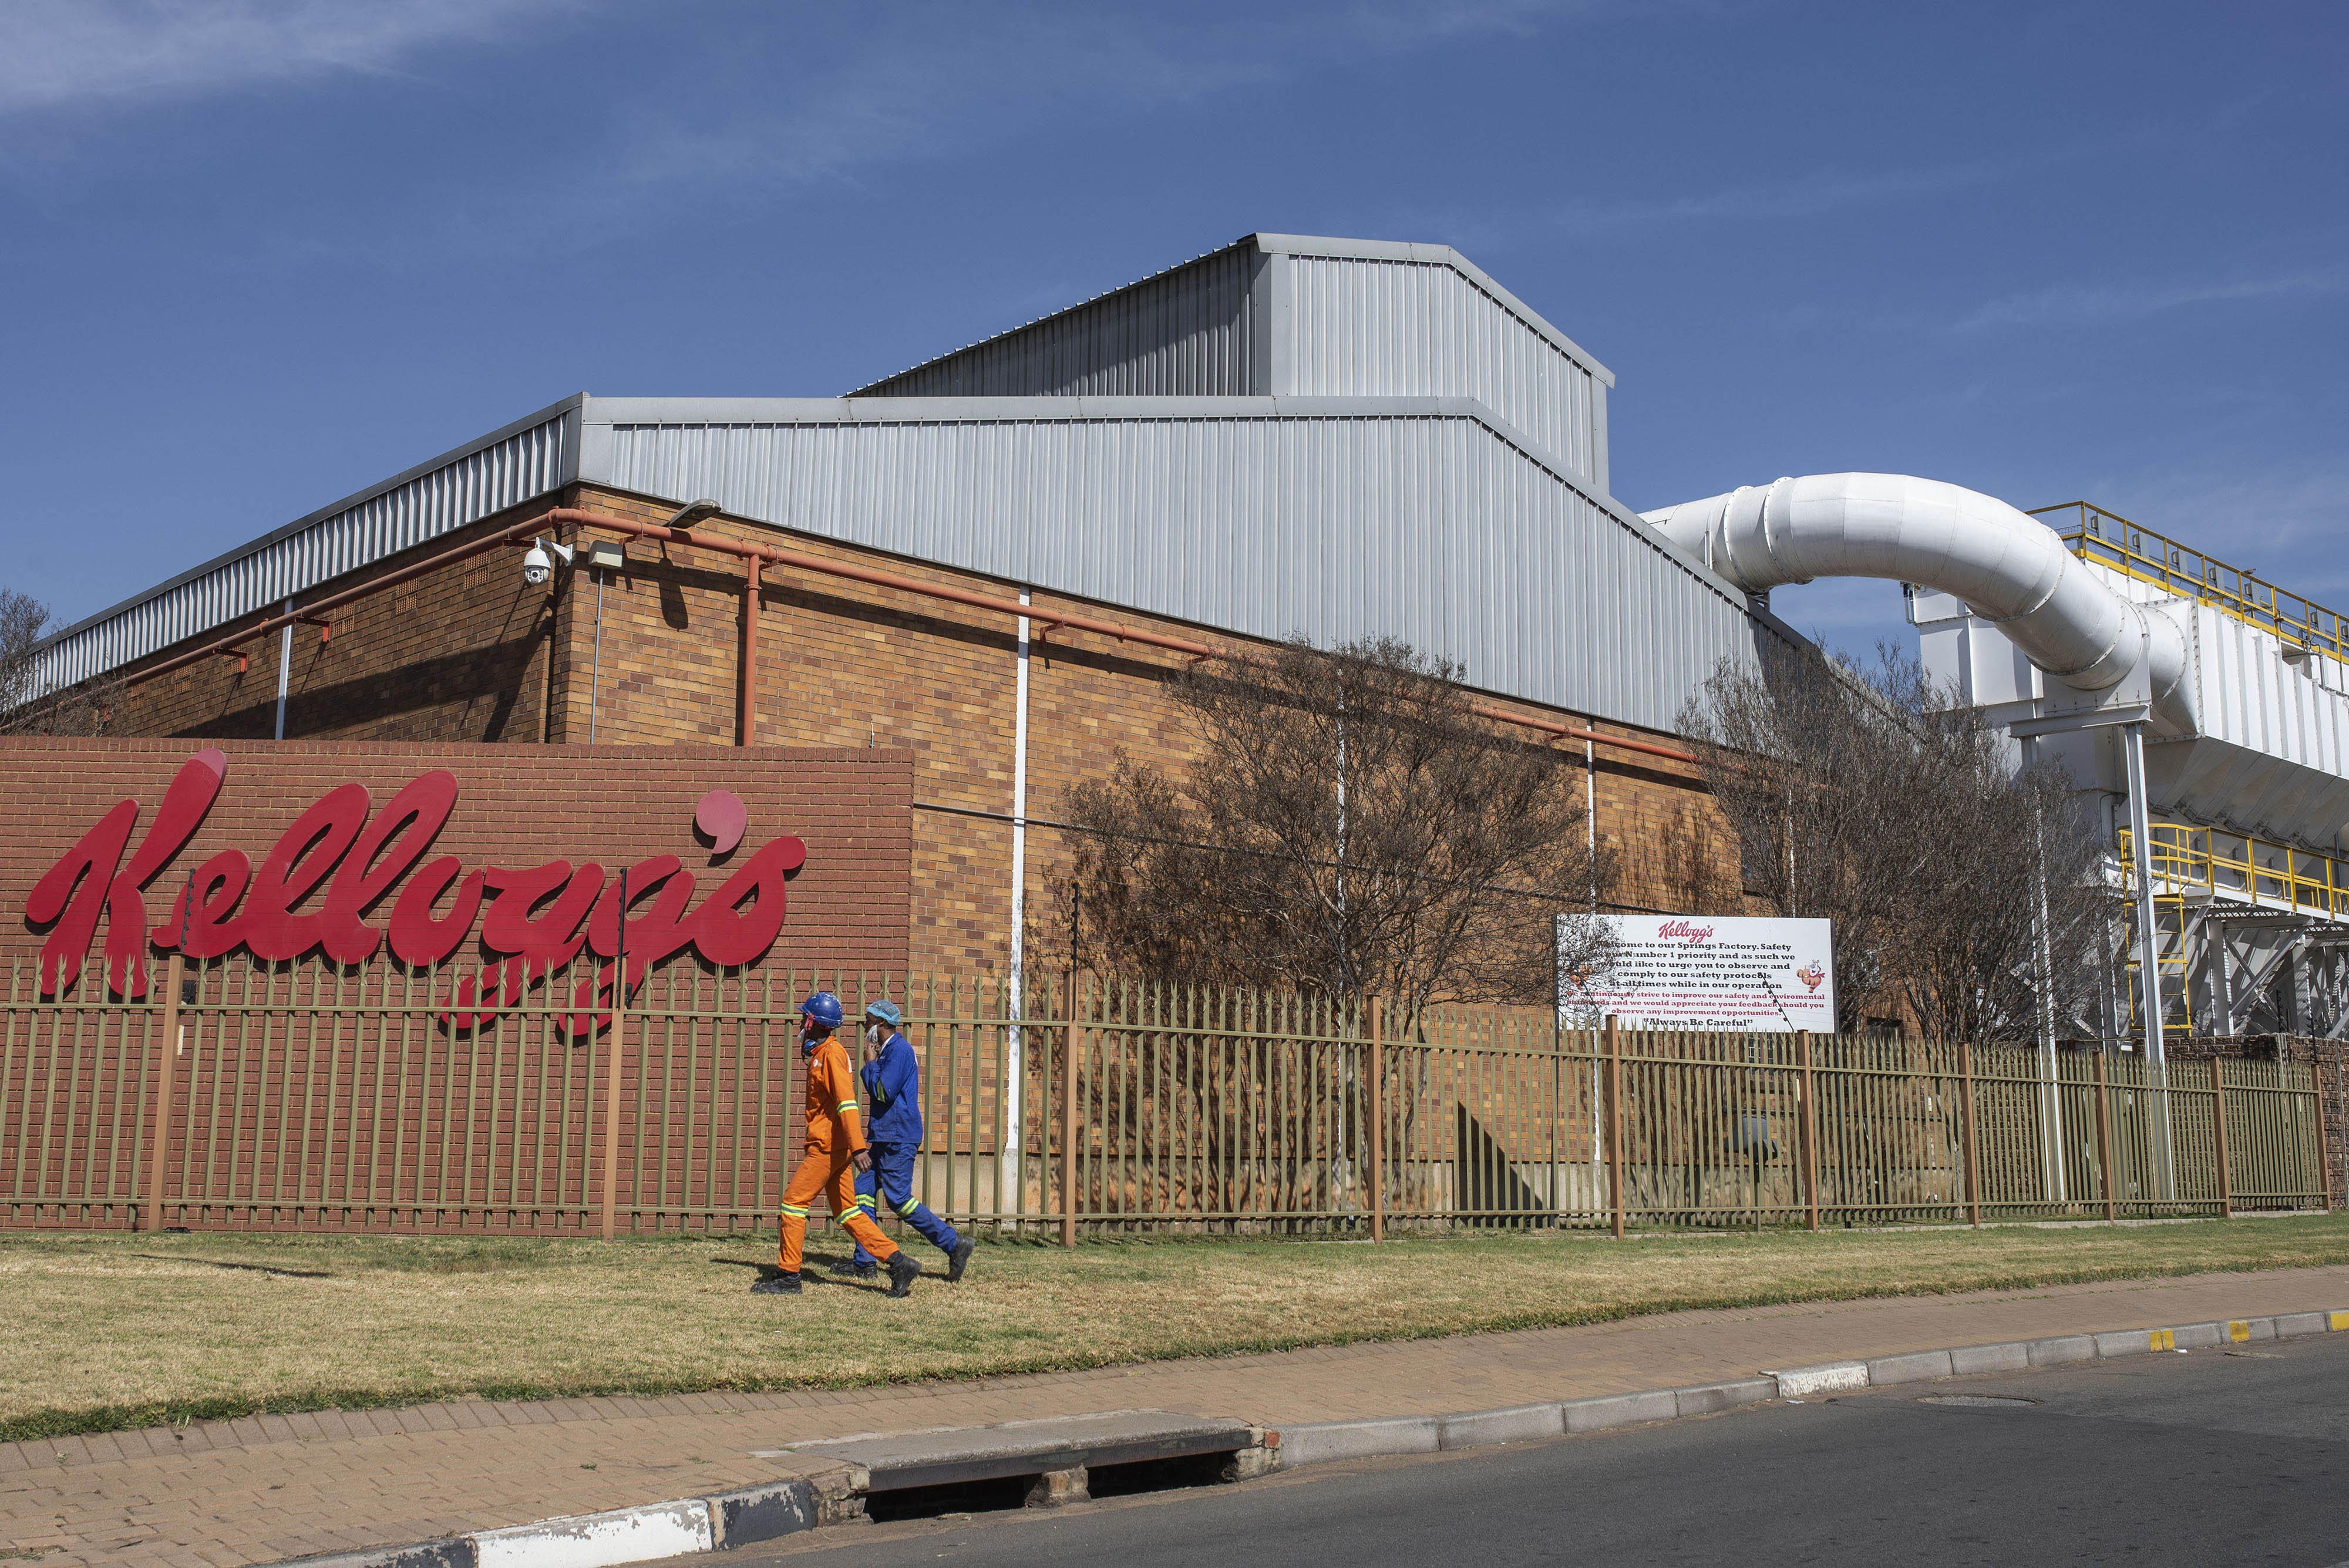 kellogg's factory